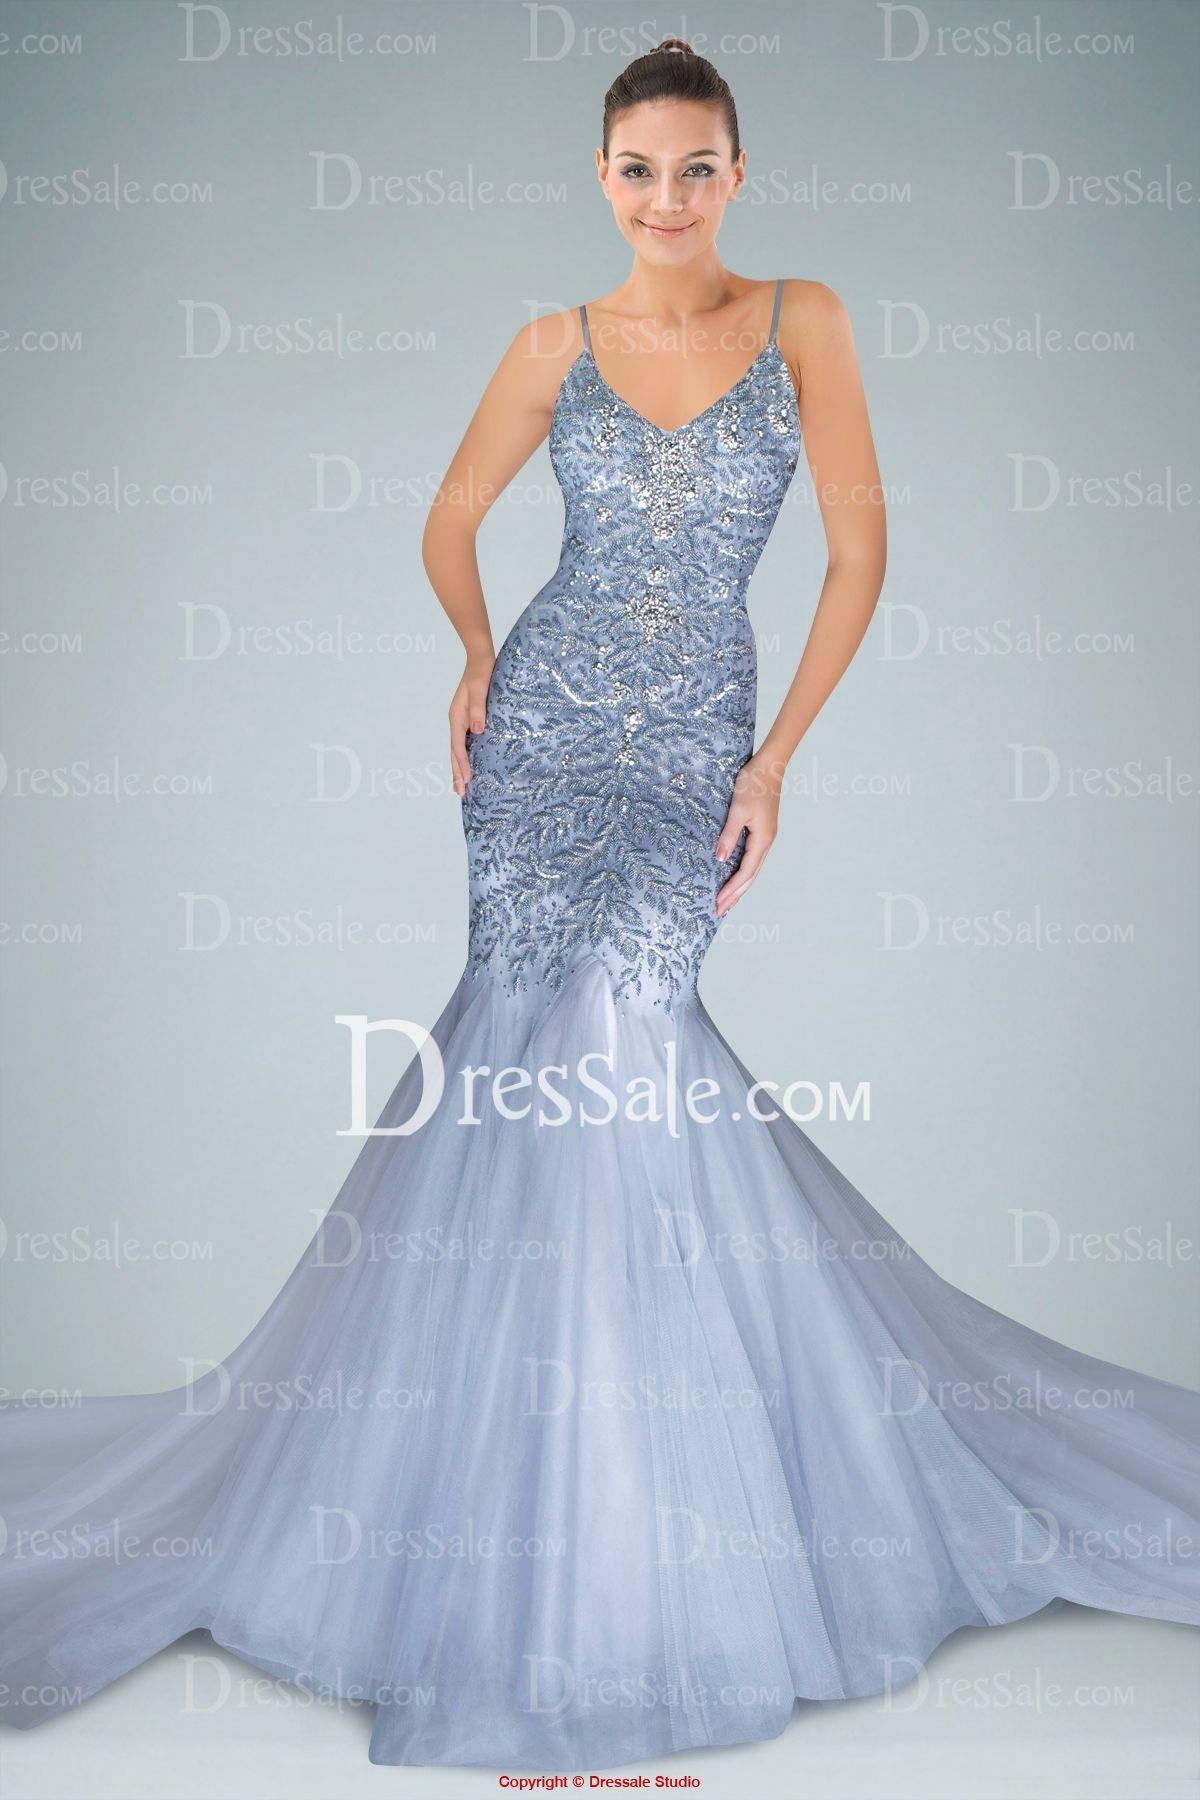 Impressive Spaghetti Straps Mermaid Evening Dress with Appliqued ...